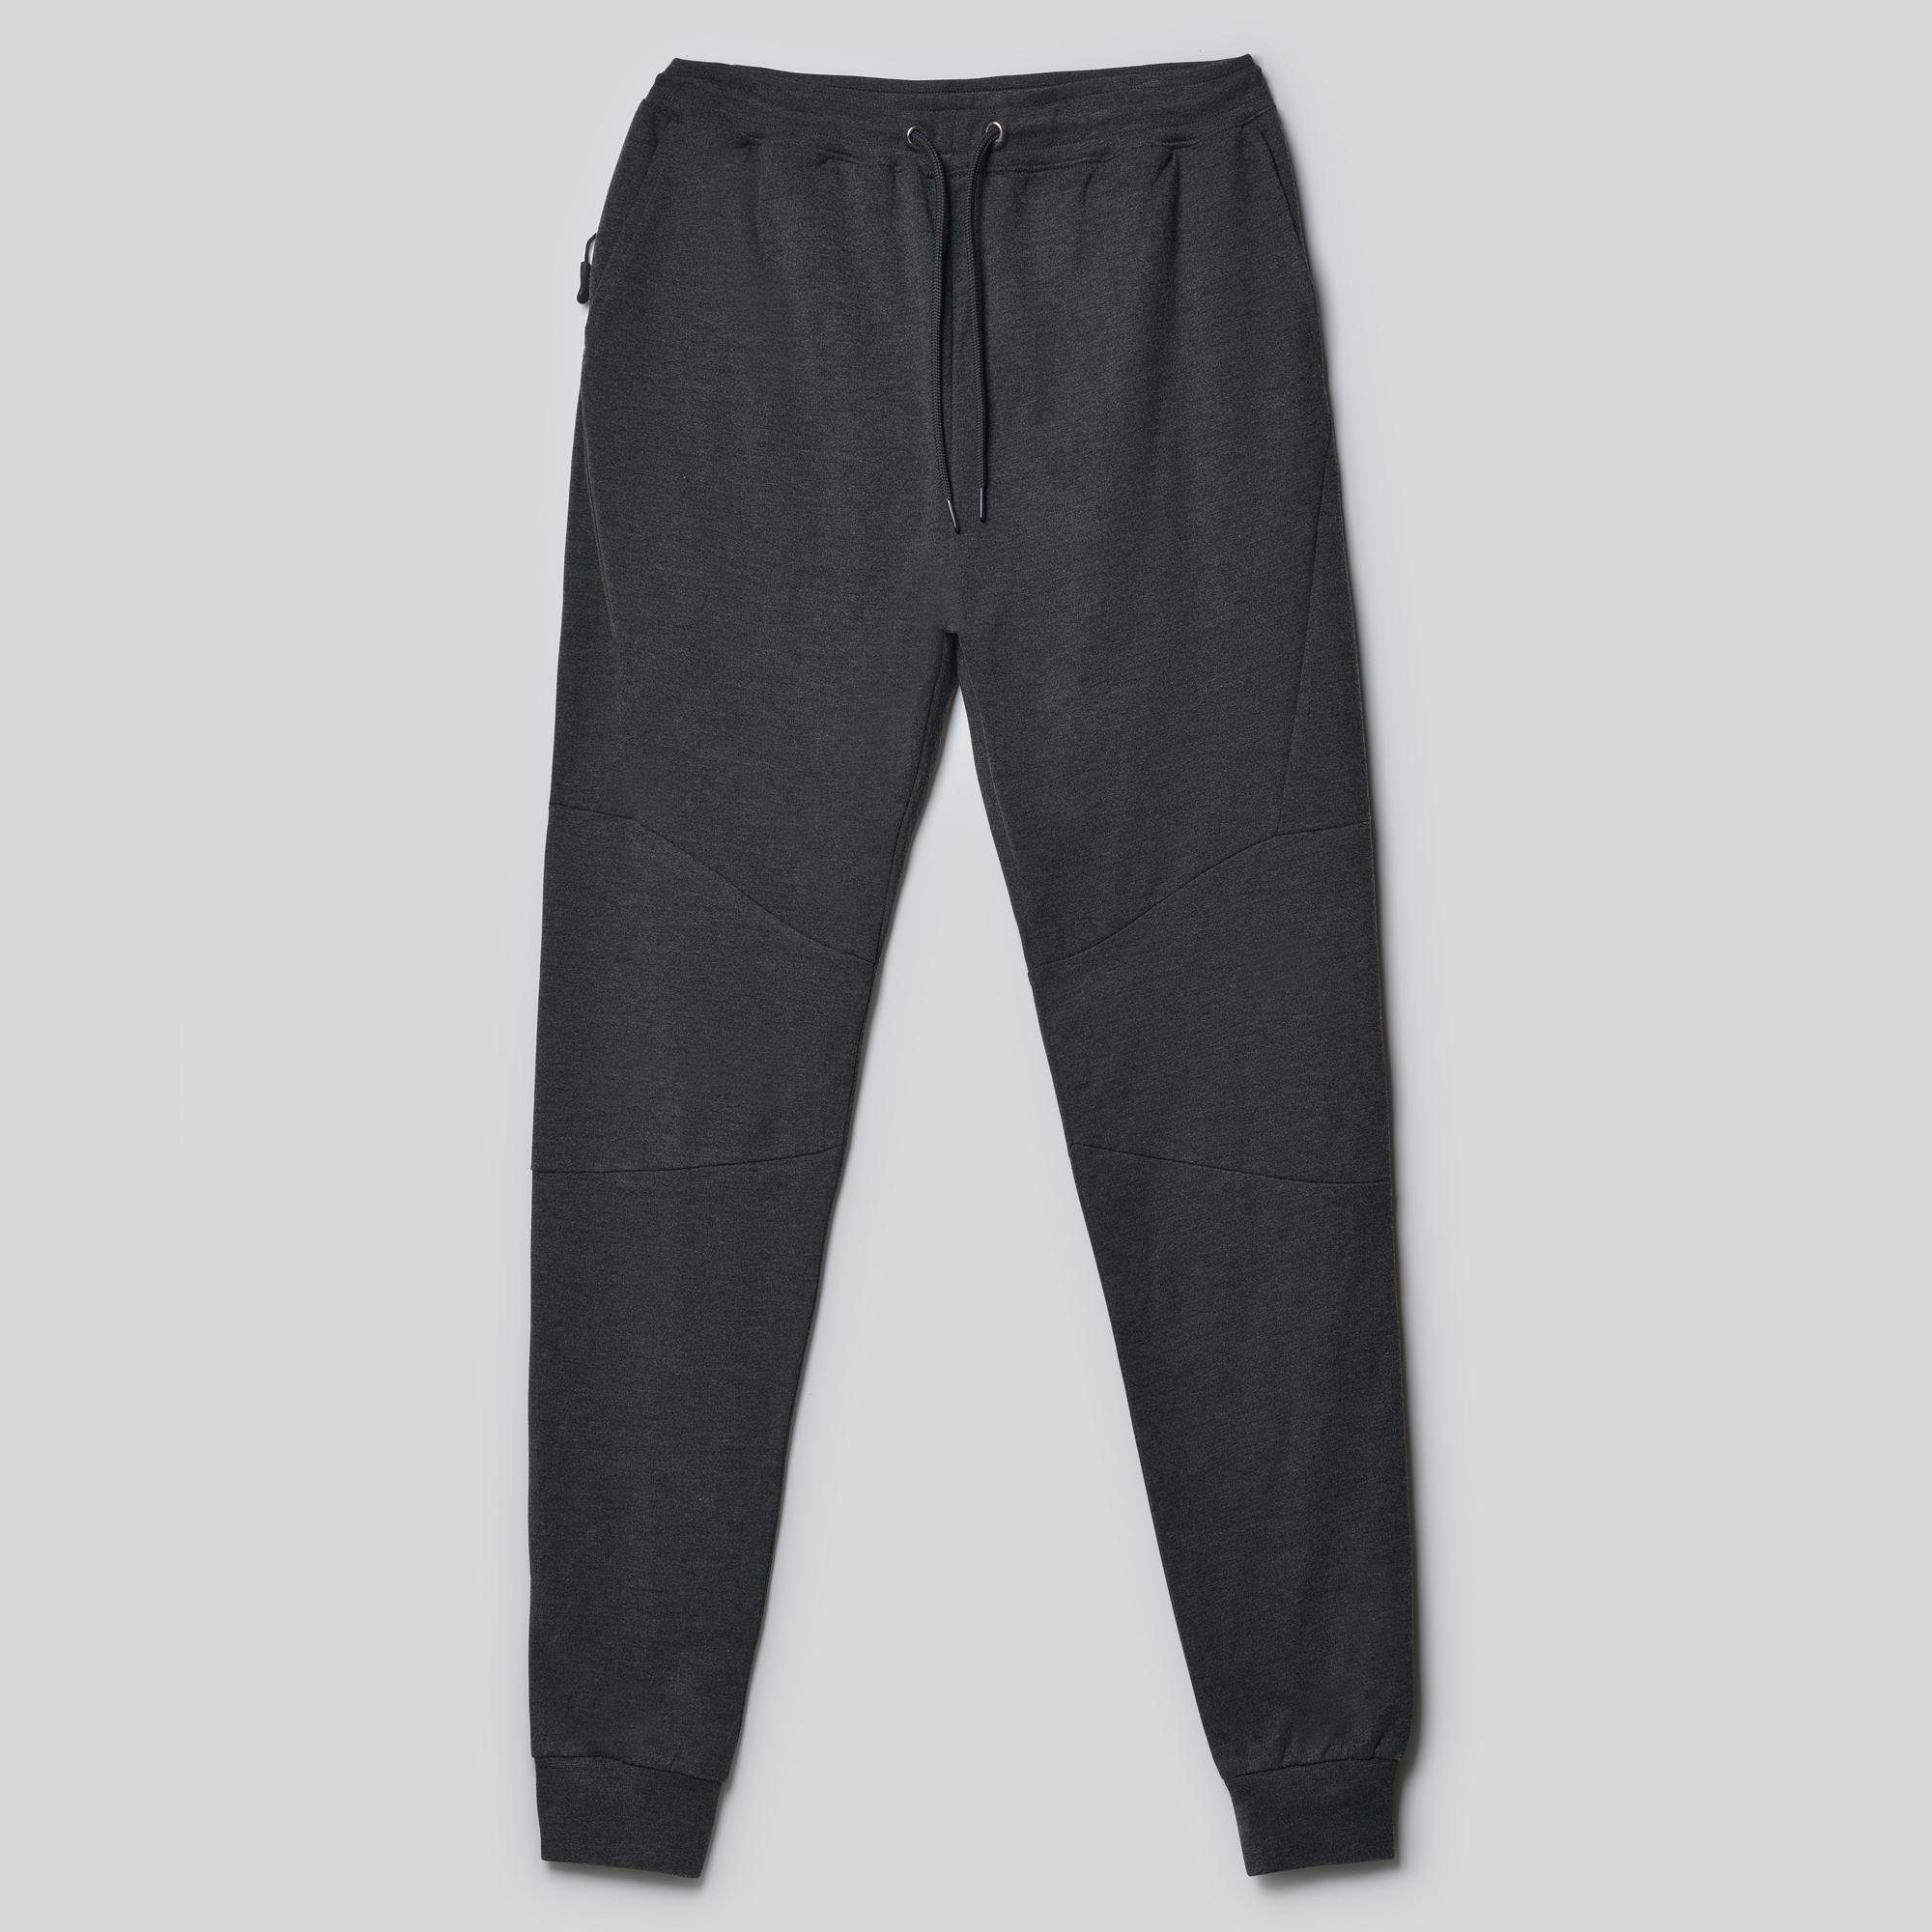 Pantalón largo ROLY Cerler